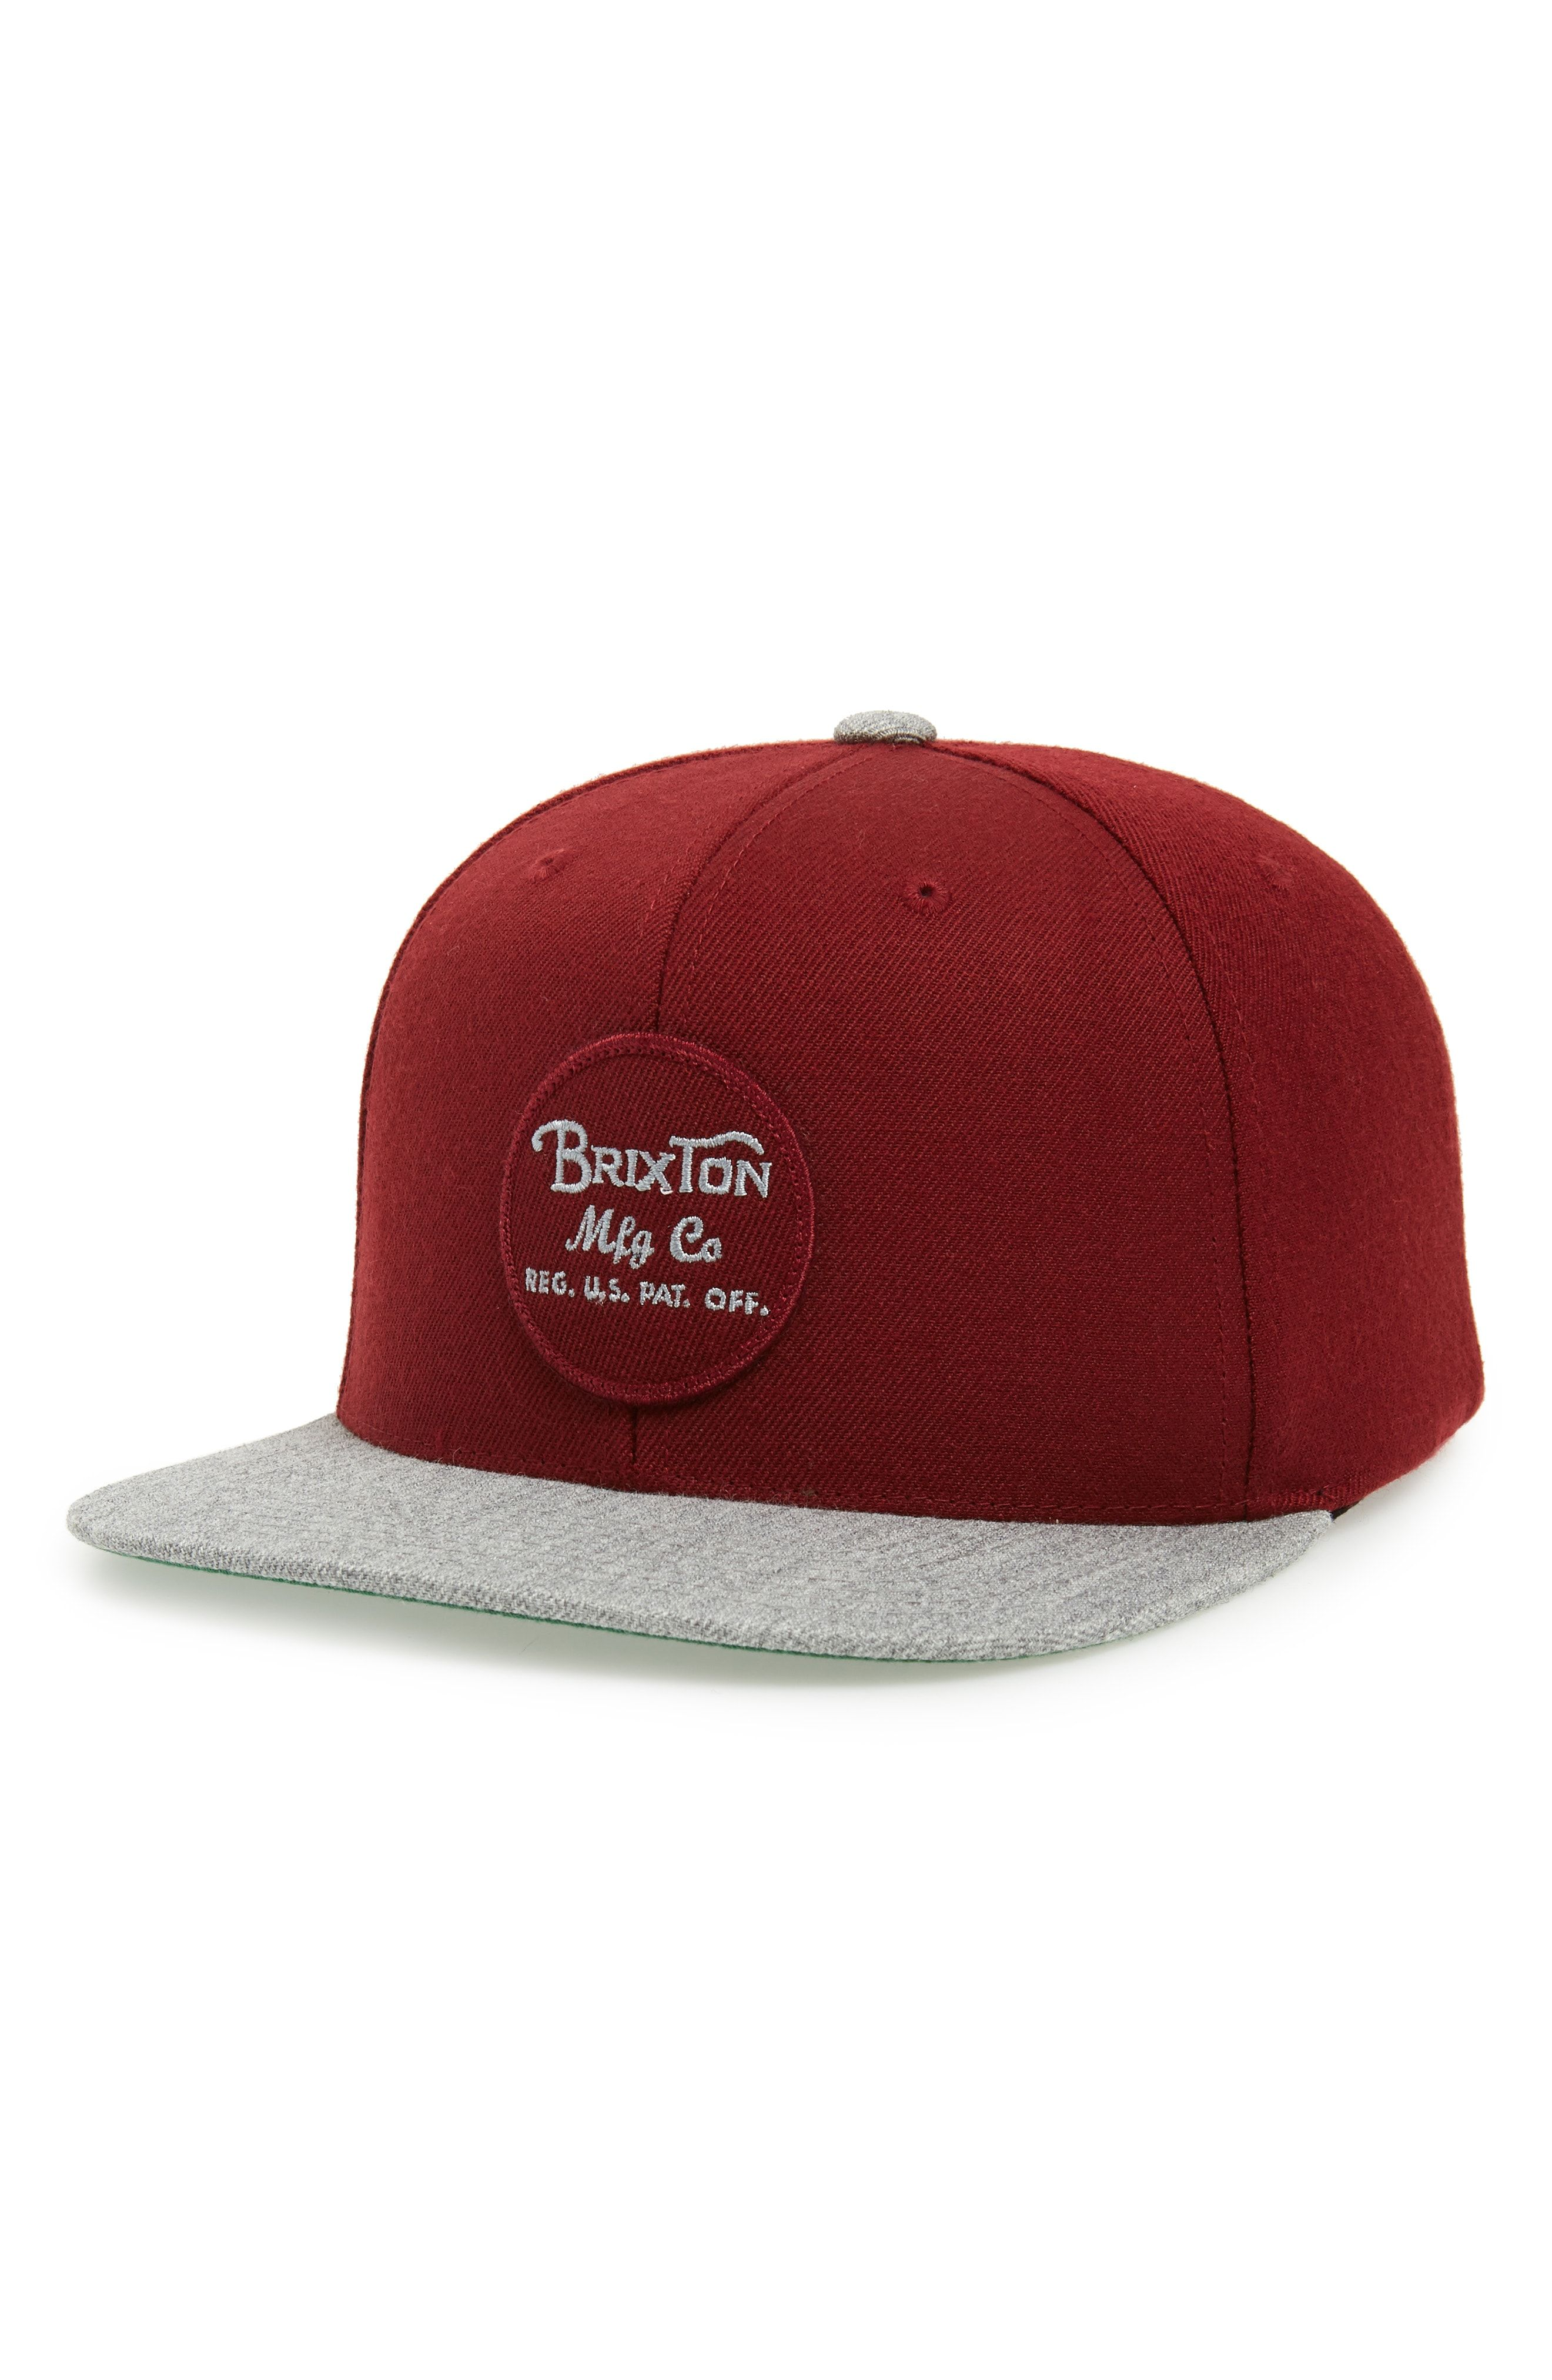 3a930cb004104 ... norway brixton wheeler snapback cap red. brixton brixton snapback cap  b5e52 8a211